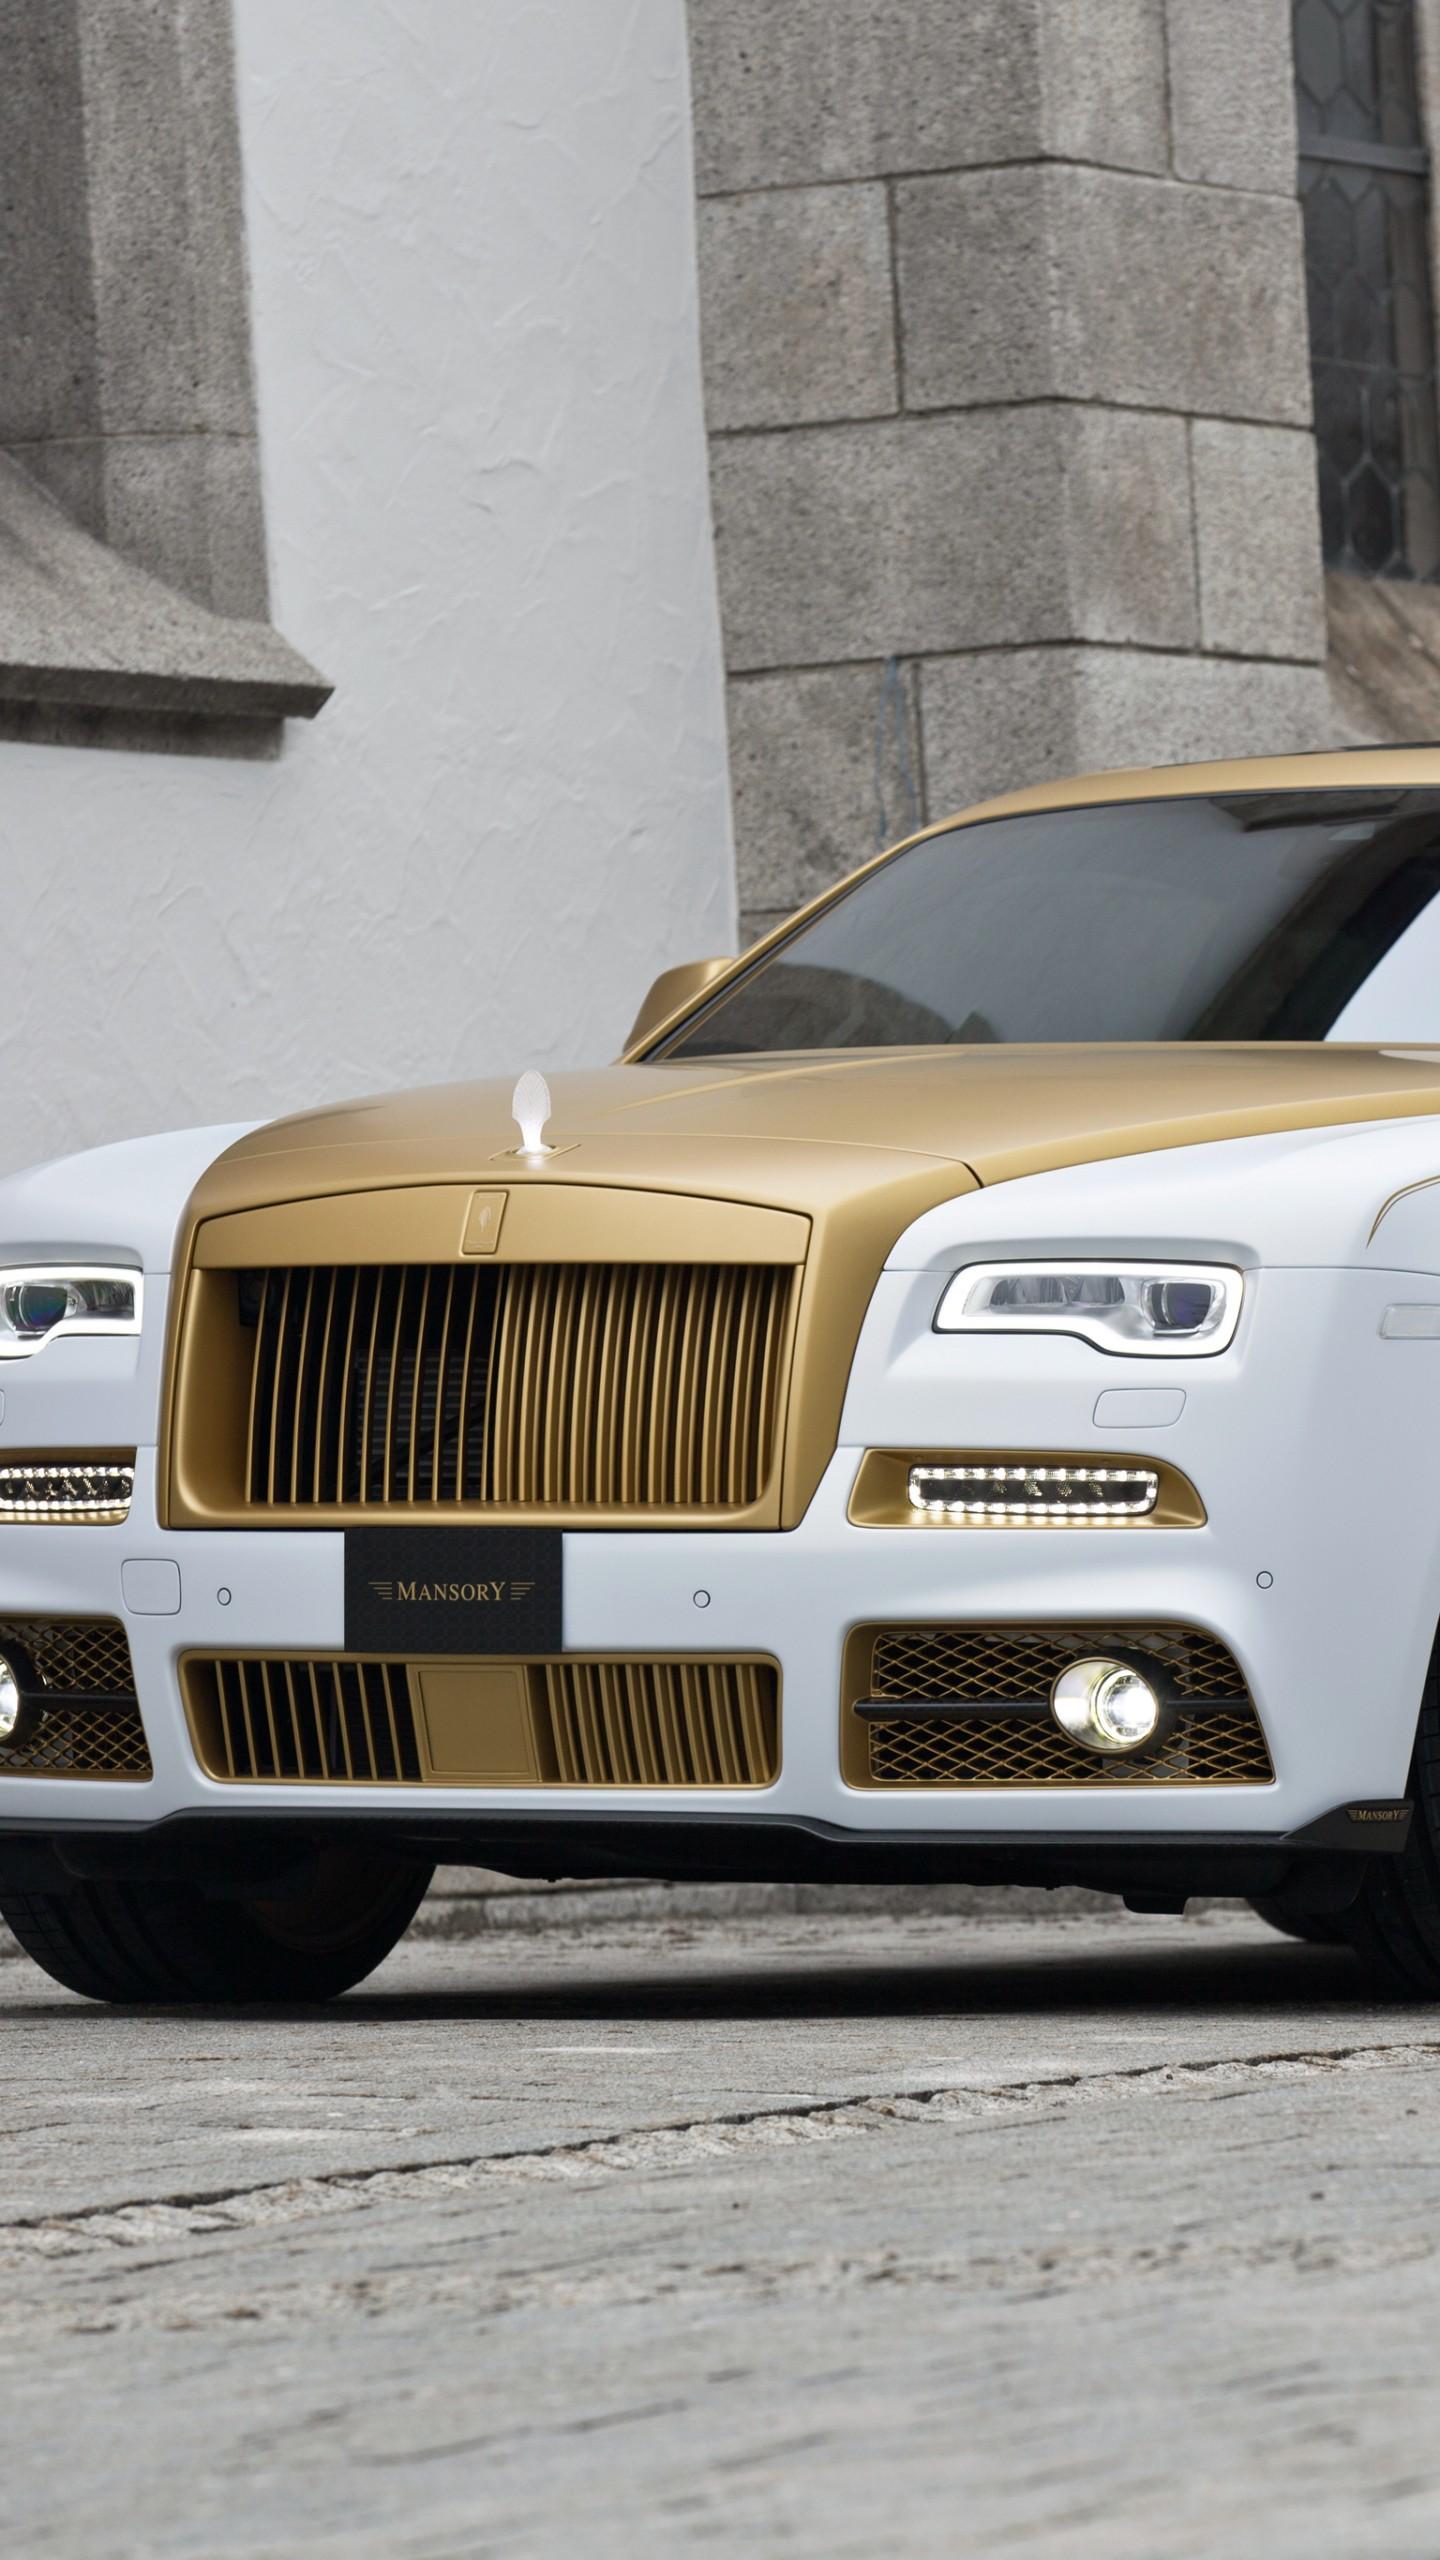 Wallpaper Mansory Rolls Royce Wraith Wraith Palm Edition 999 Geneva Auto Show 2016 Luxury Cars Gold Cars Bikes 9100